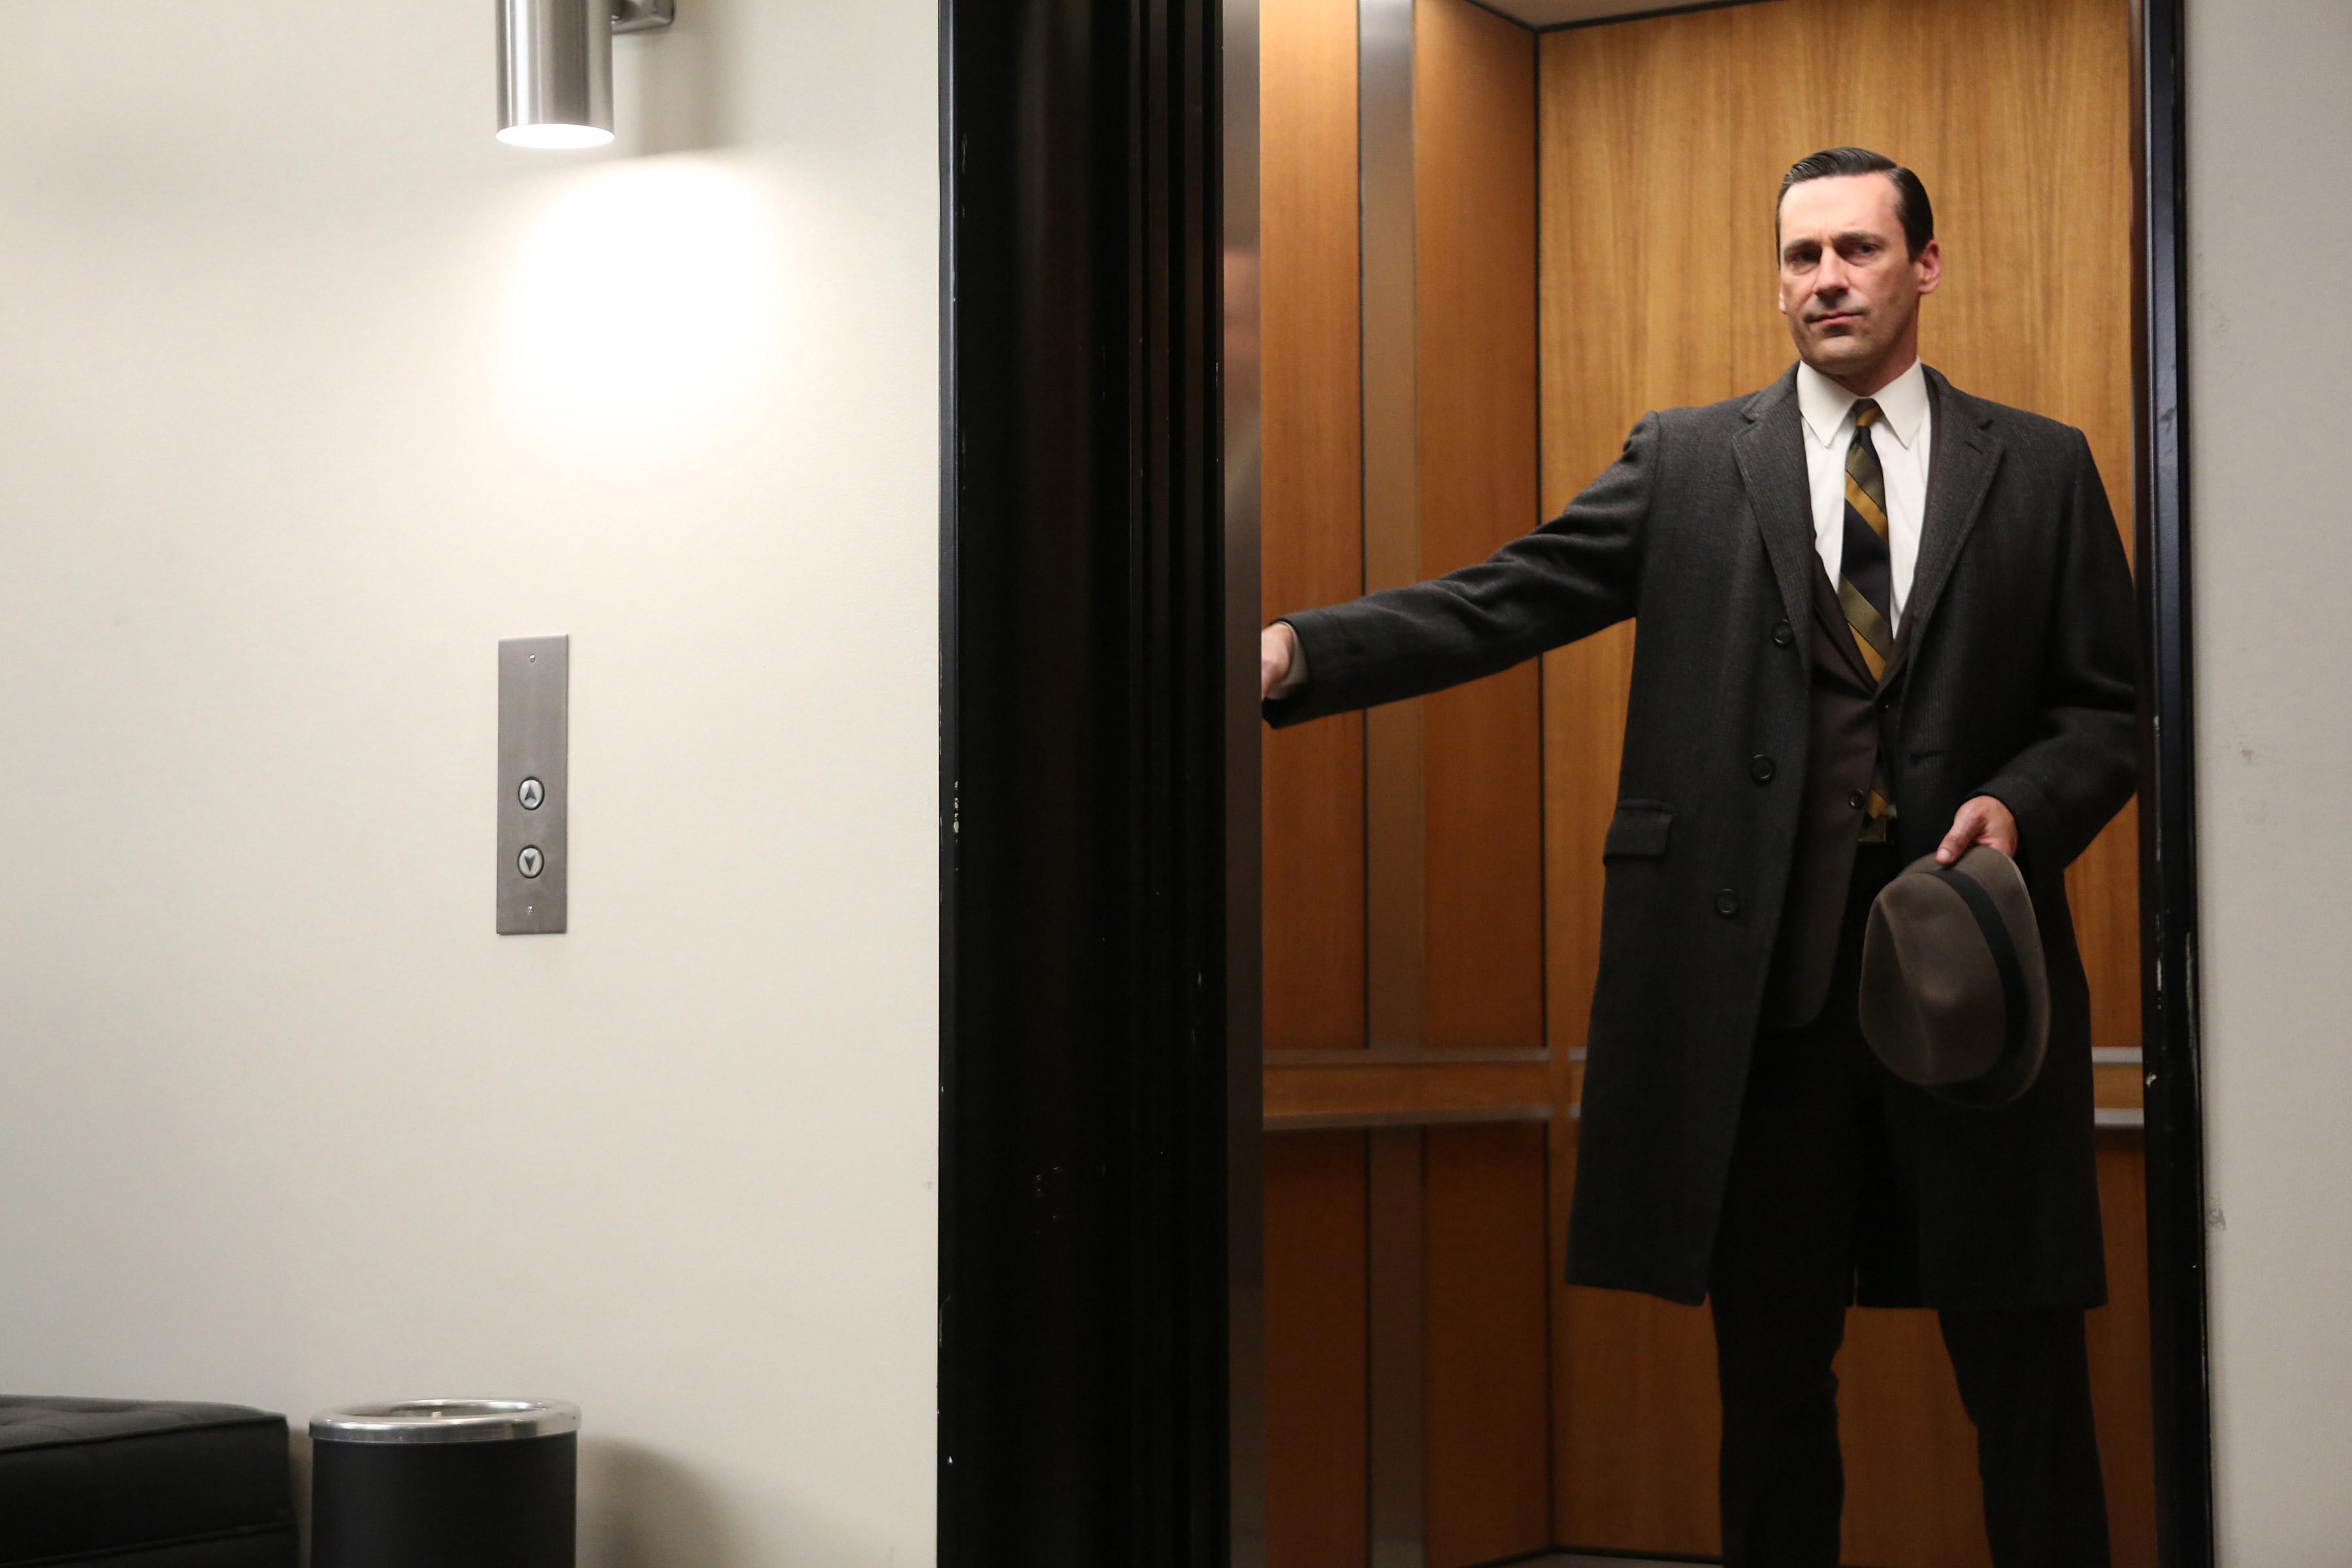 Don Draper Window : Matt zoller seitz looks back at mad men season vulture